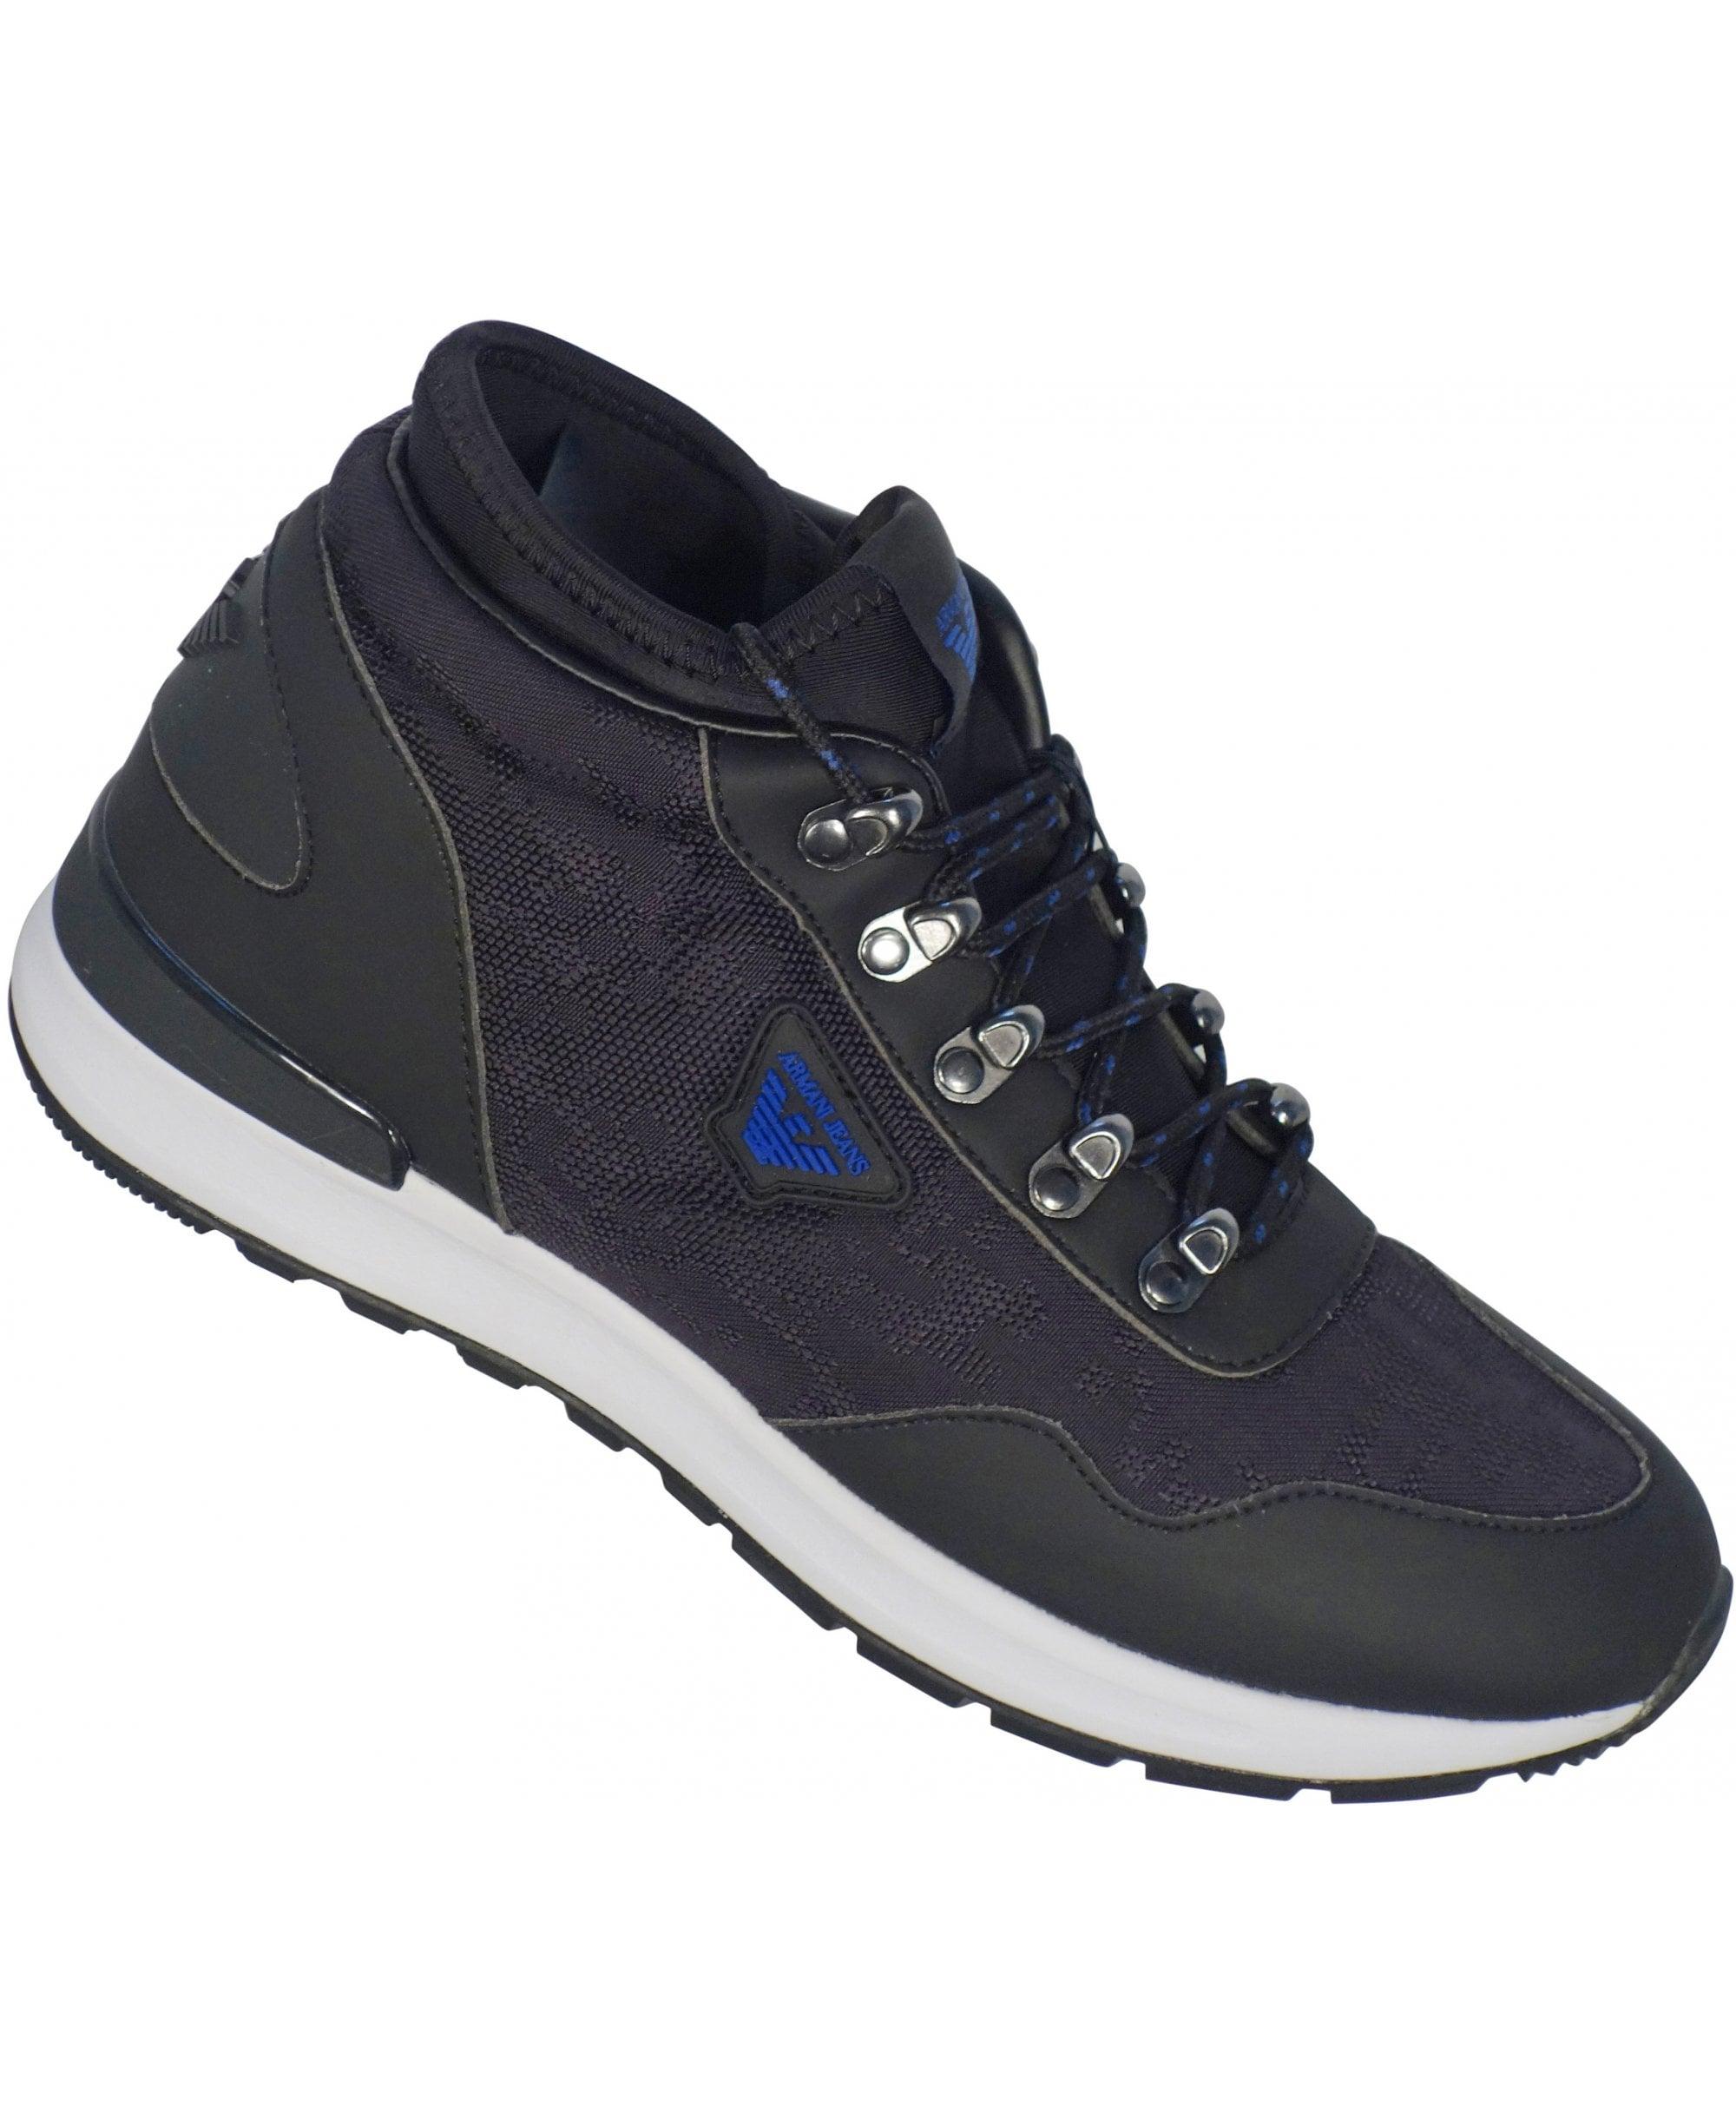 Armani Trainer/boots Hiking Style Mid